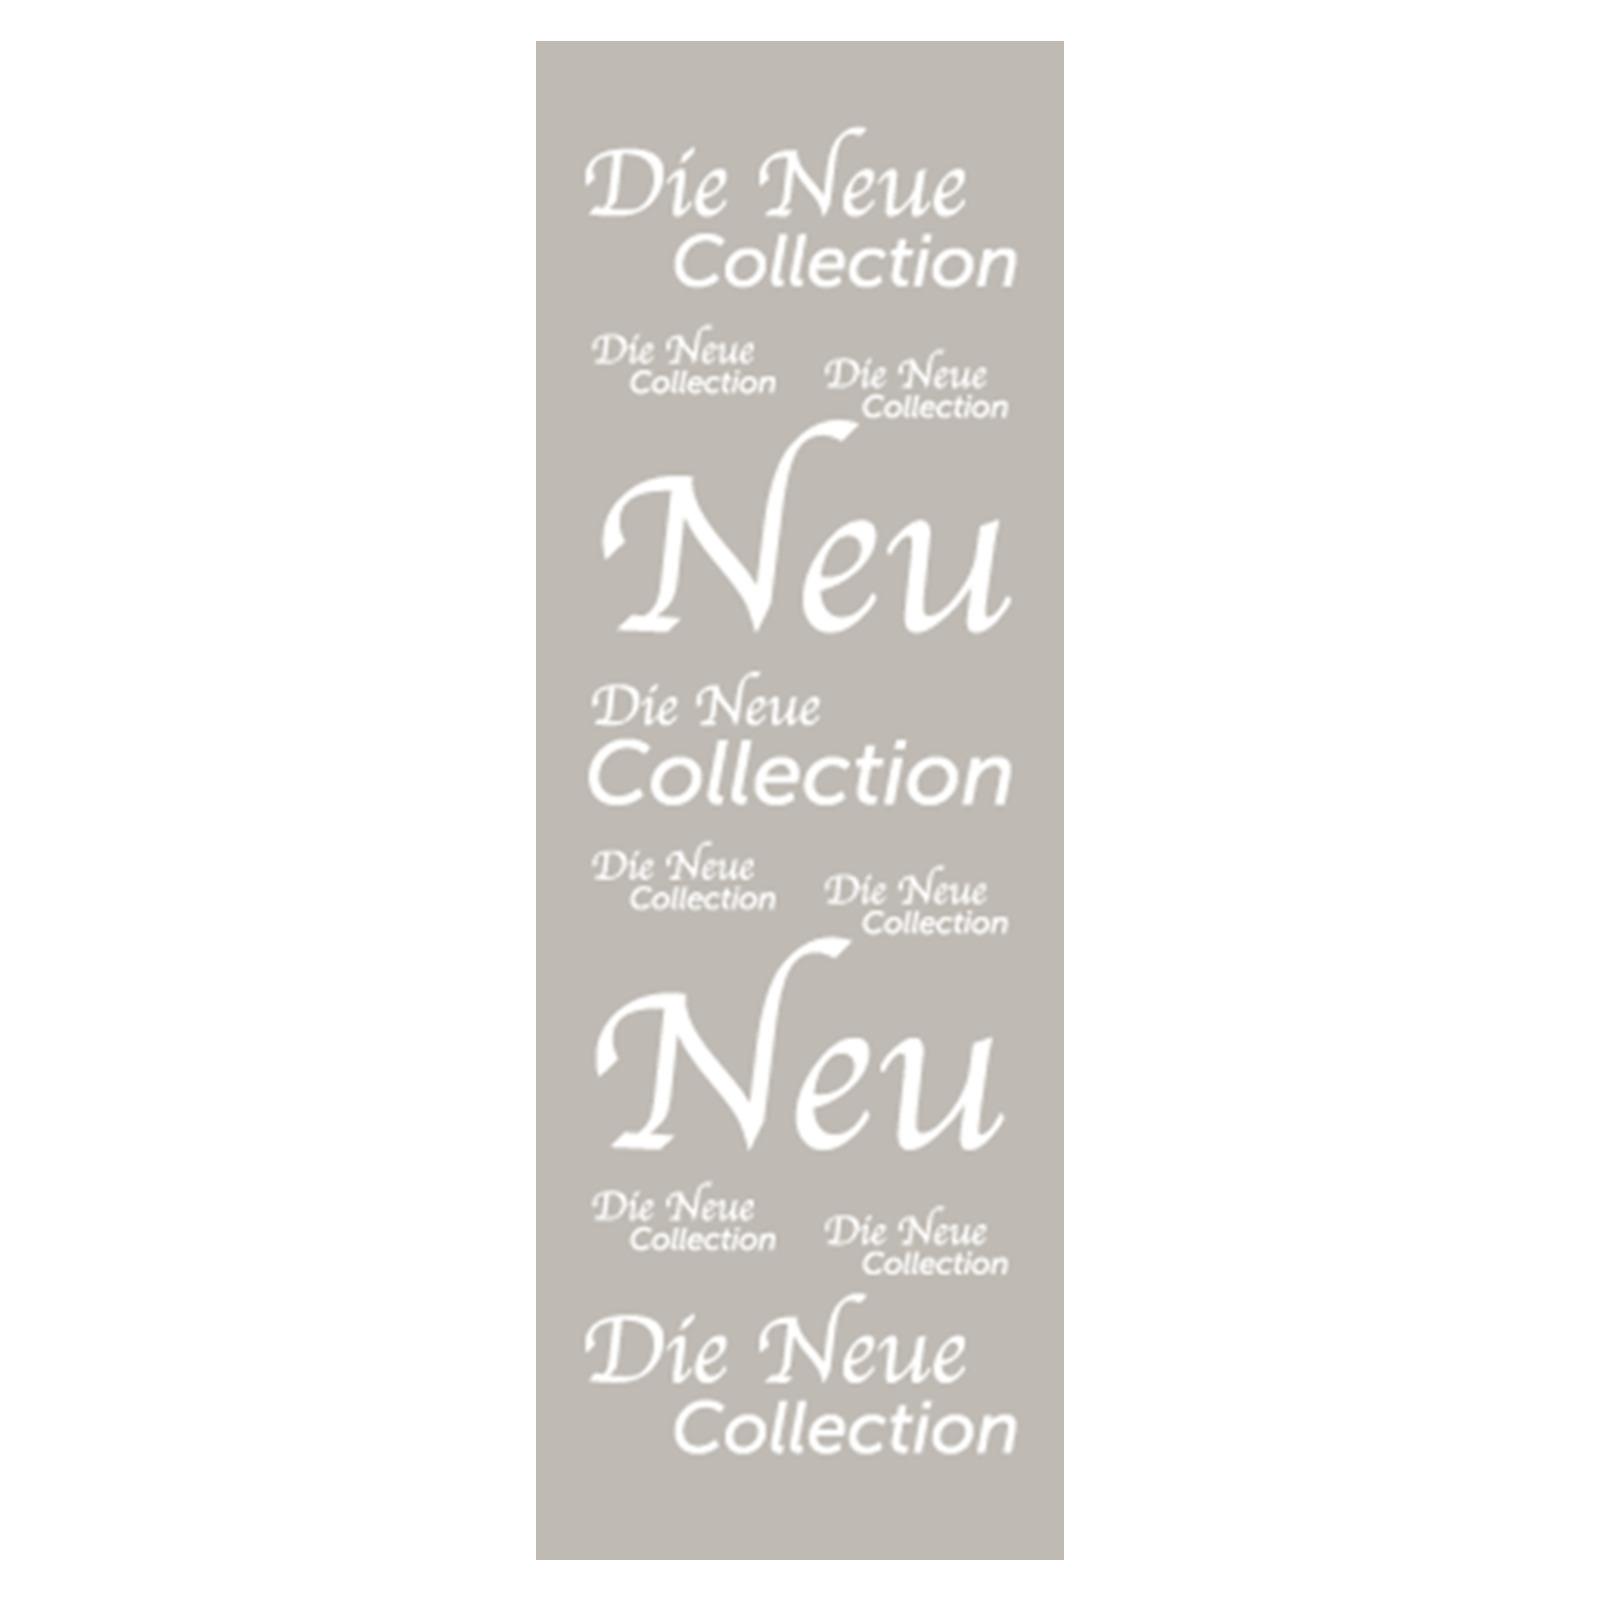 langbahn die neue collection plakate die neue kollektion. Black Bedroom Furniture Sets. Home Design Ideas